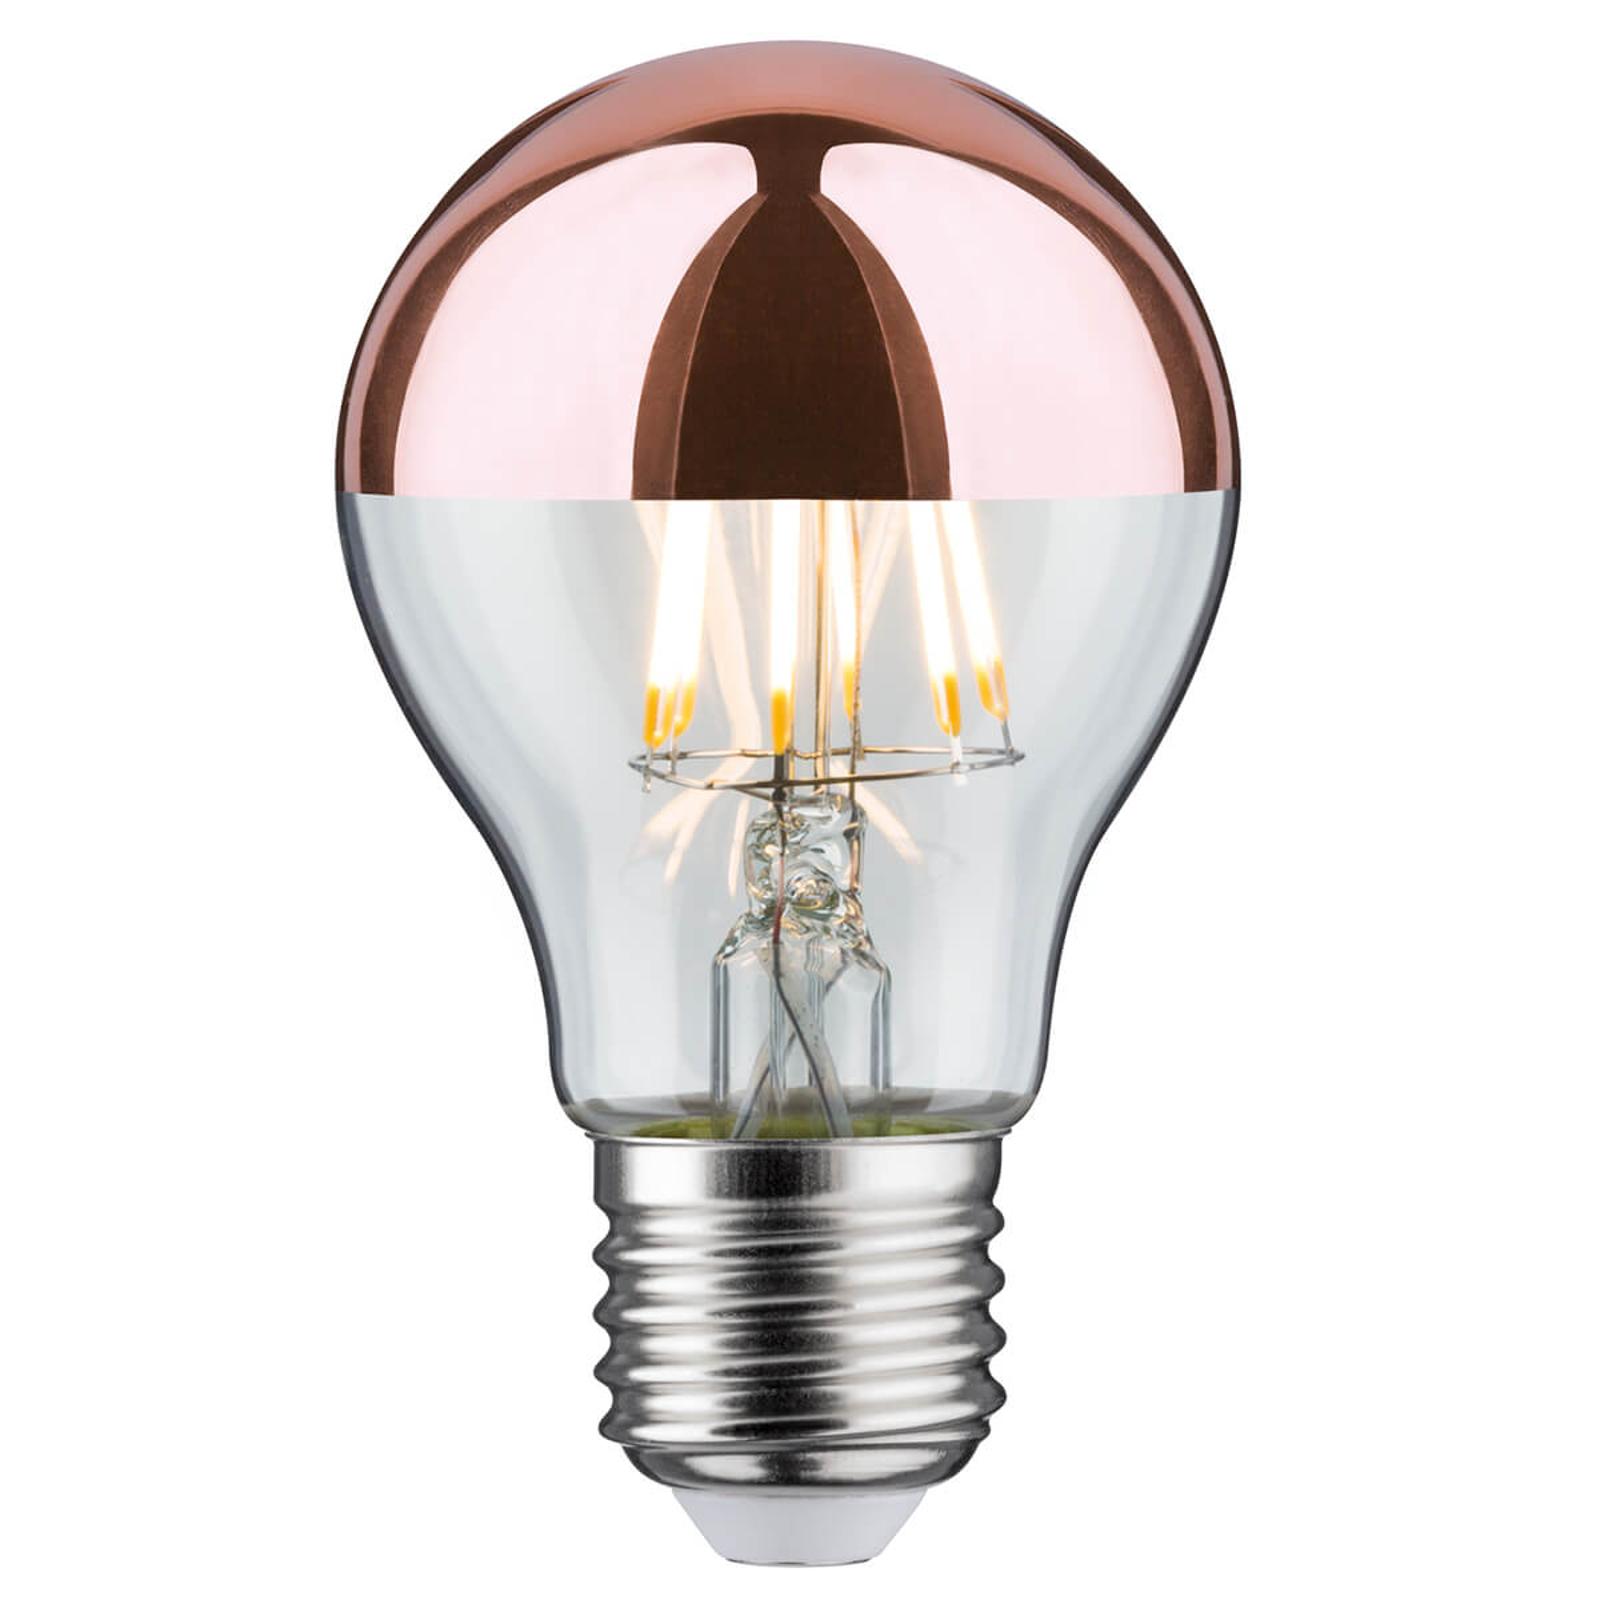 Paulmann LED-toppförspeglad lampa E27 6,5 W 827